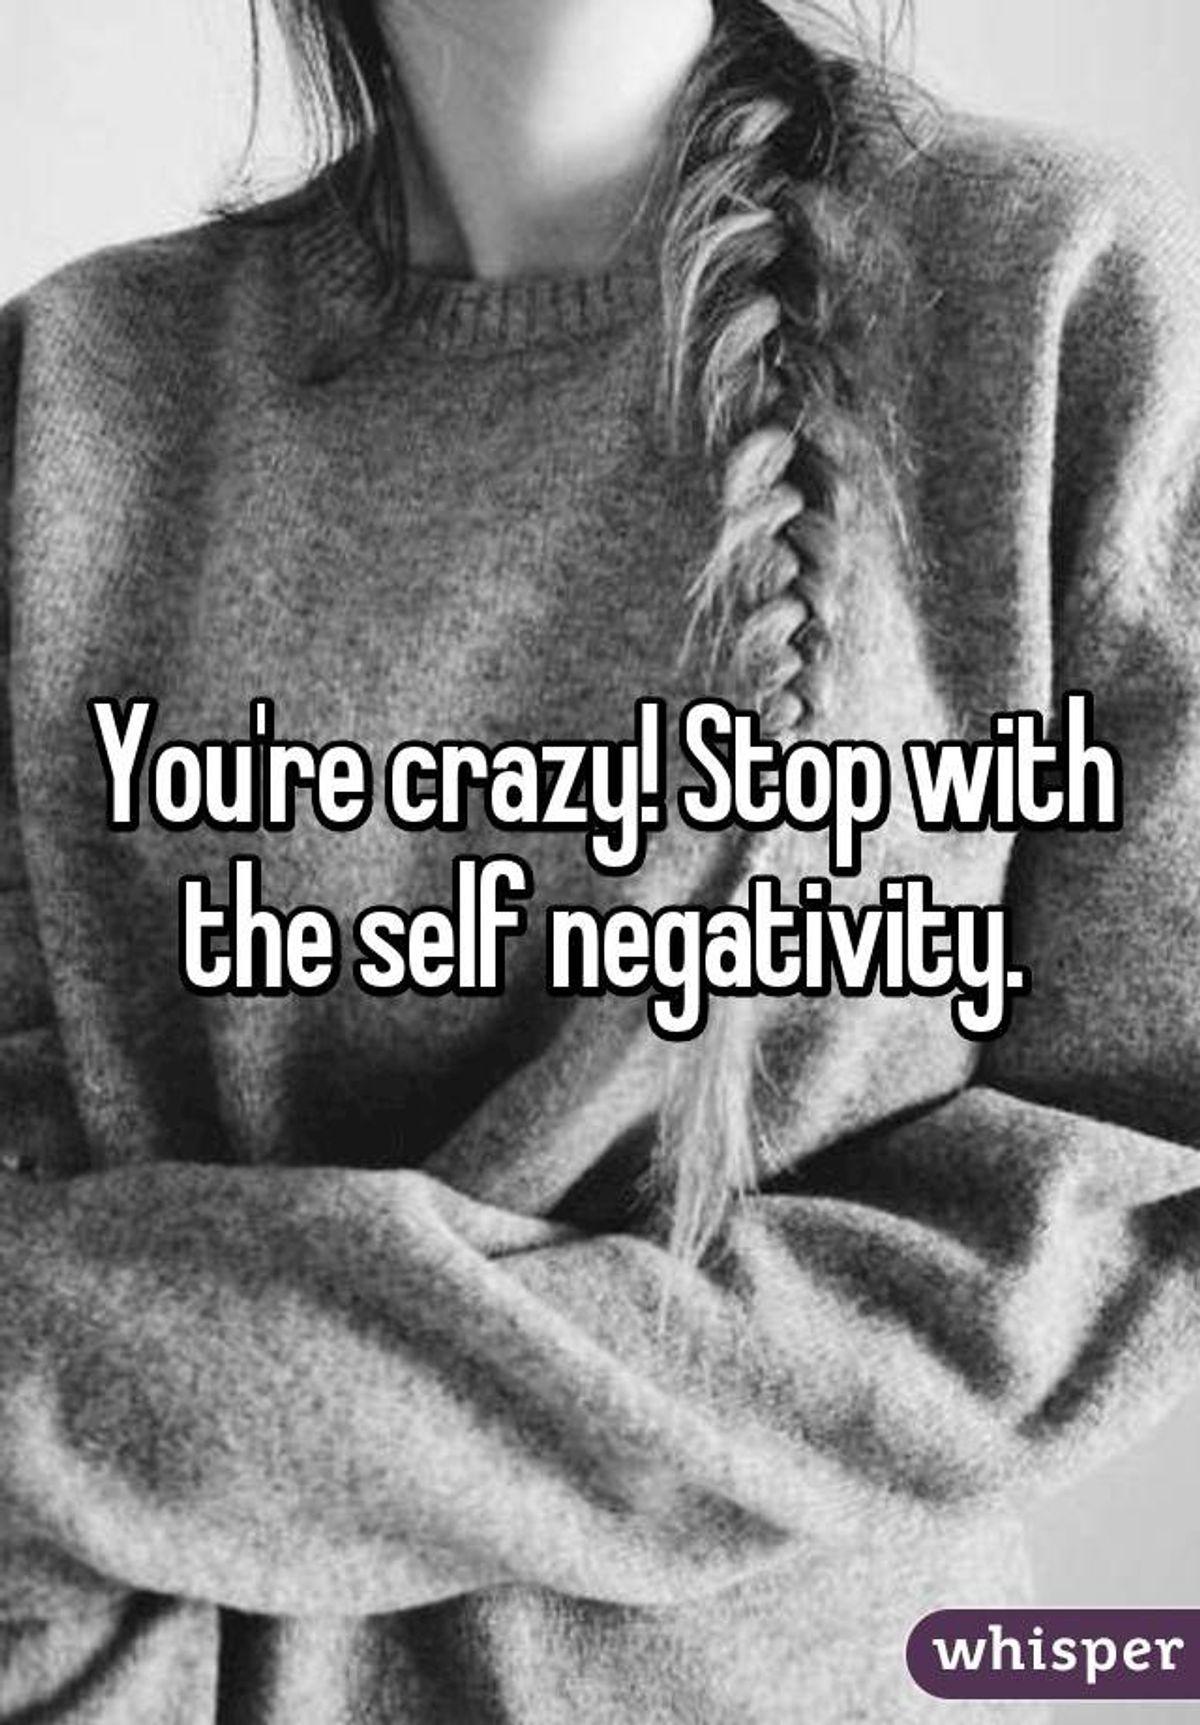 Refuse the Self-Negativity Standard